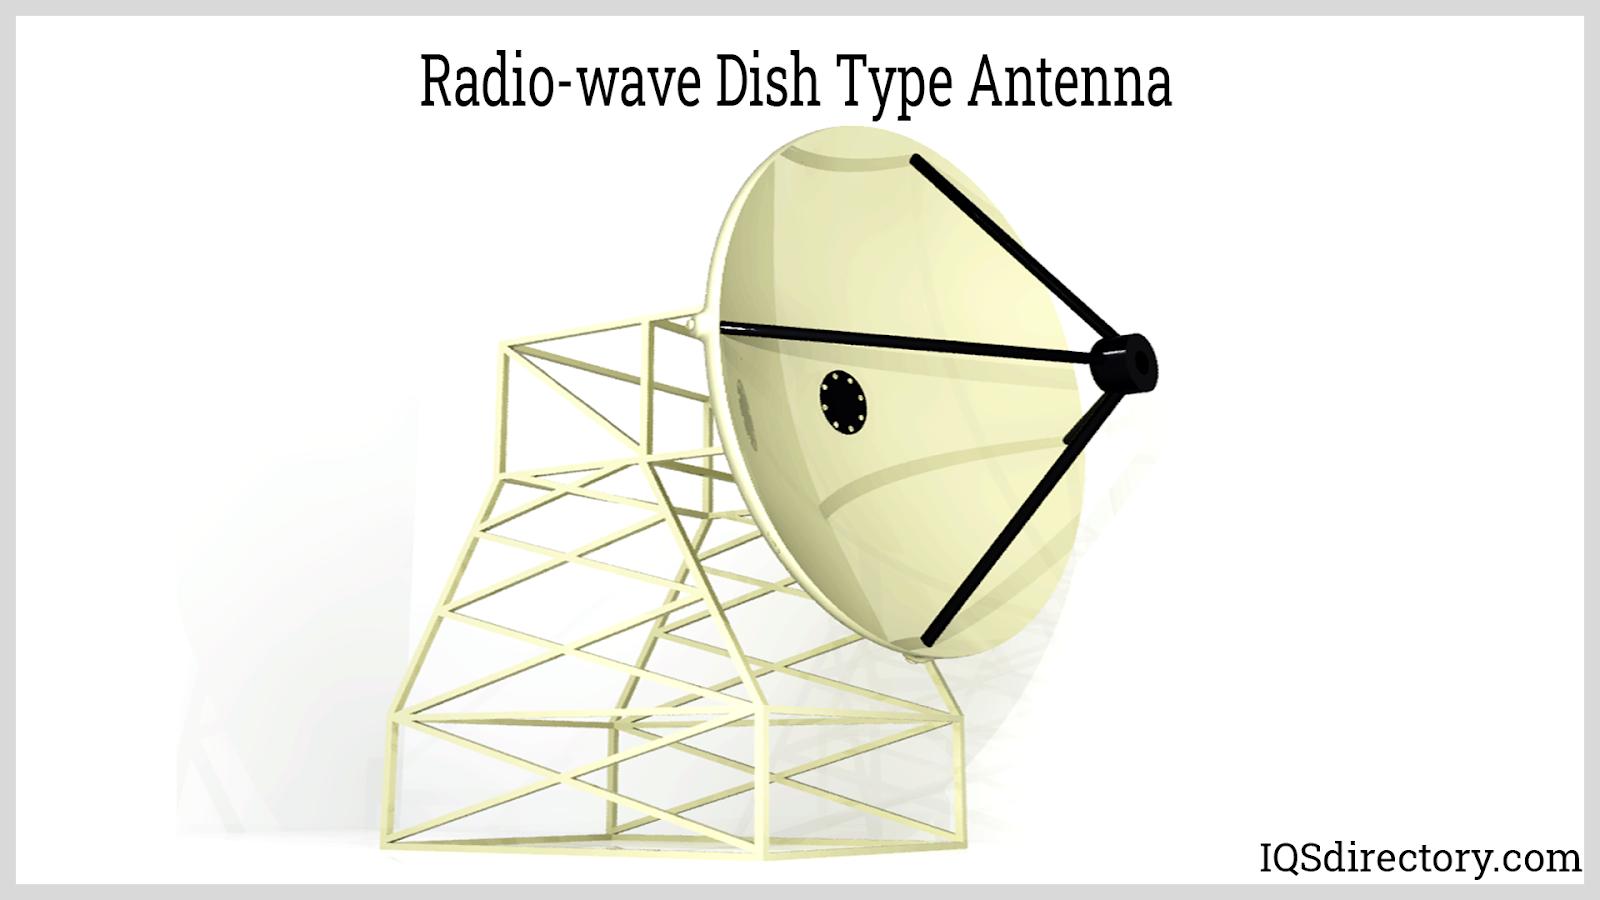 Radio-wave Dish Type Antenna